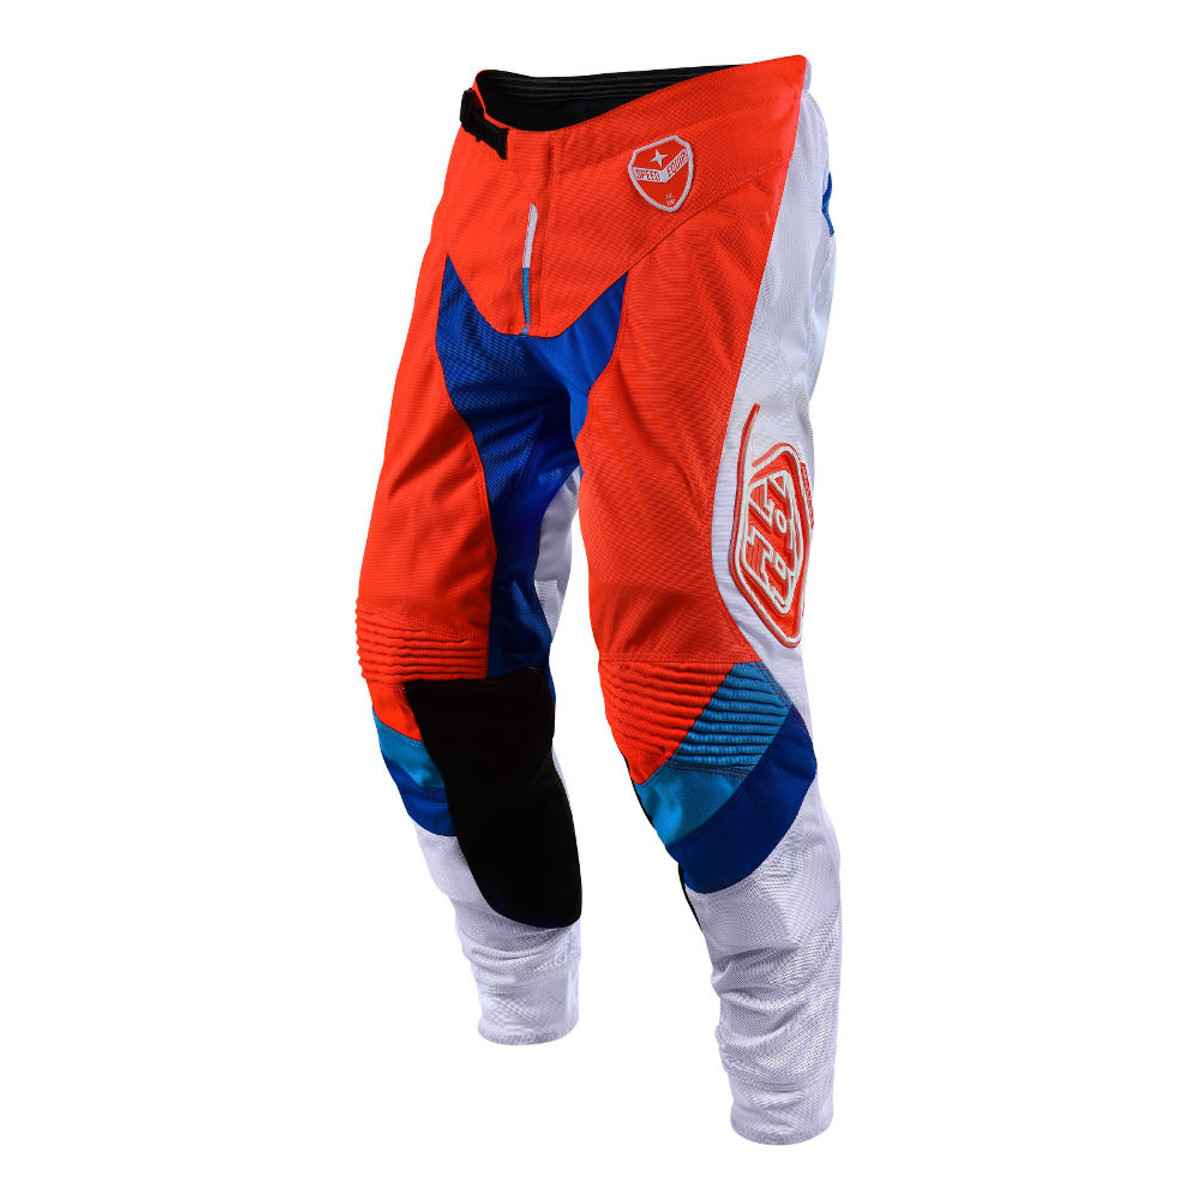 Troy Lee Designs SE Corse Jersey & Pant  Troy Lee Designs SE Corse Orange